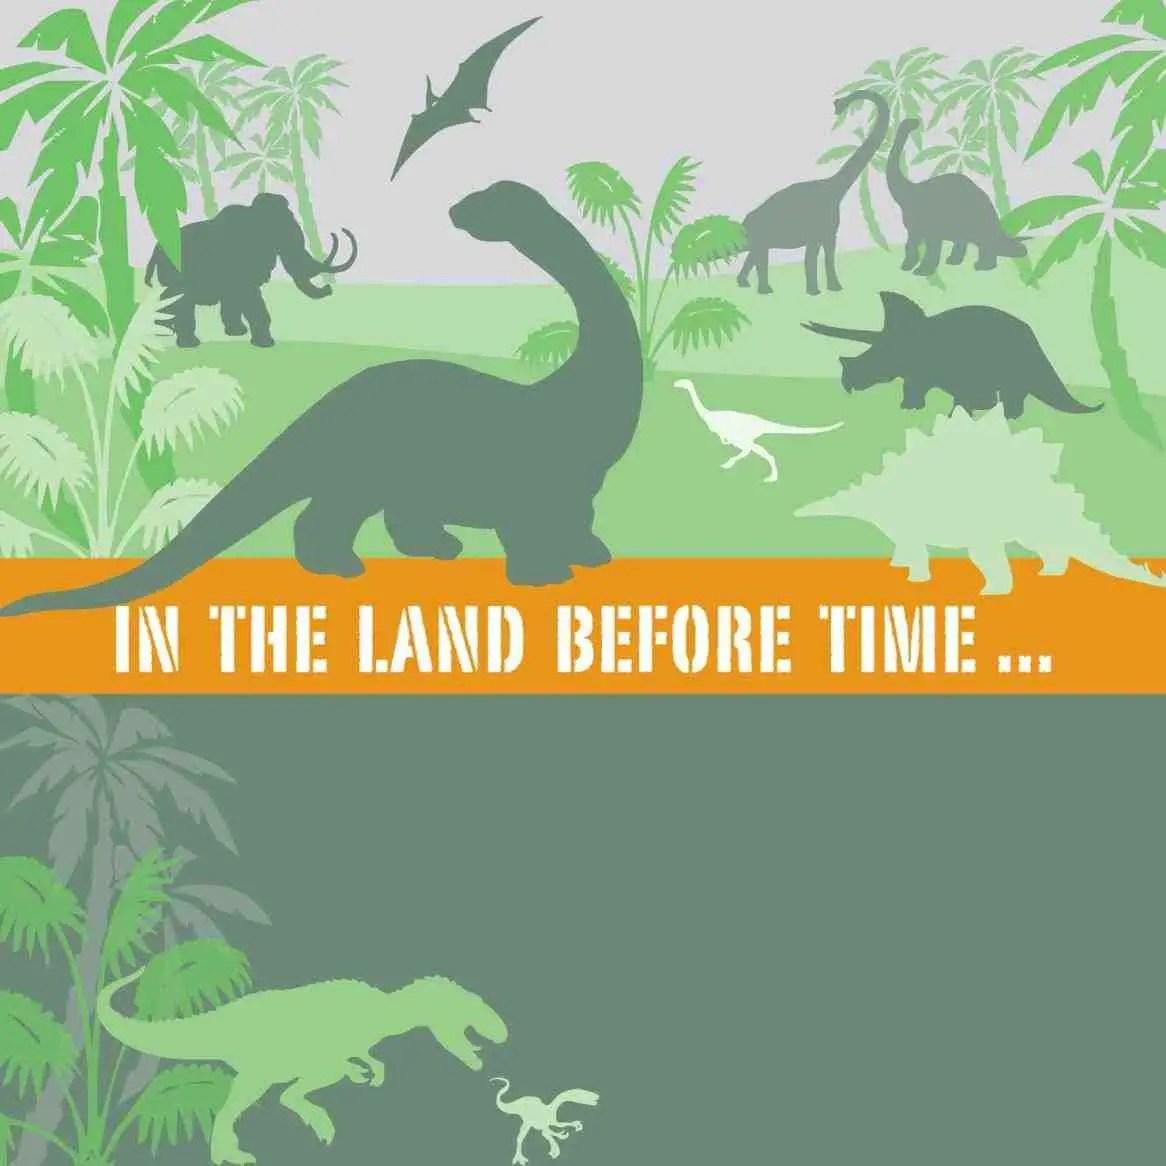 19 Roaring Dinosaur Birthday Invitations Kittybabylove Com